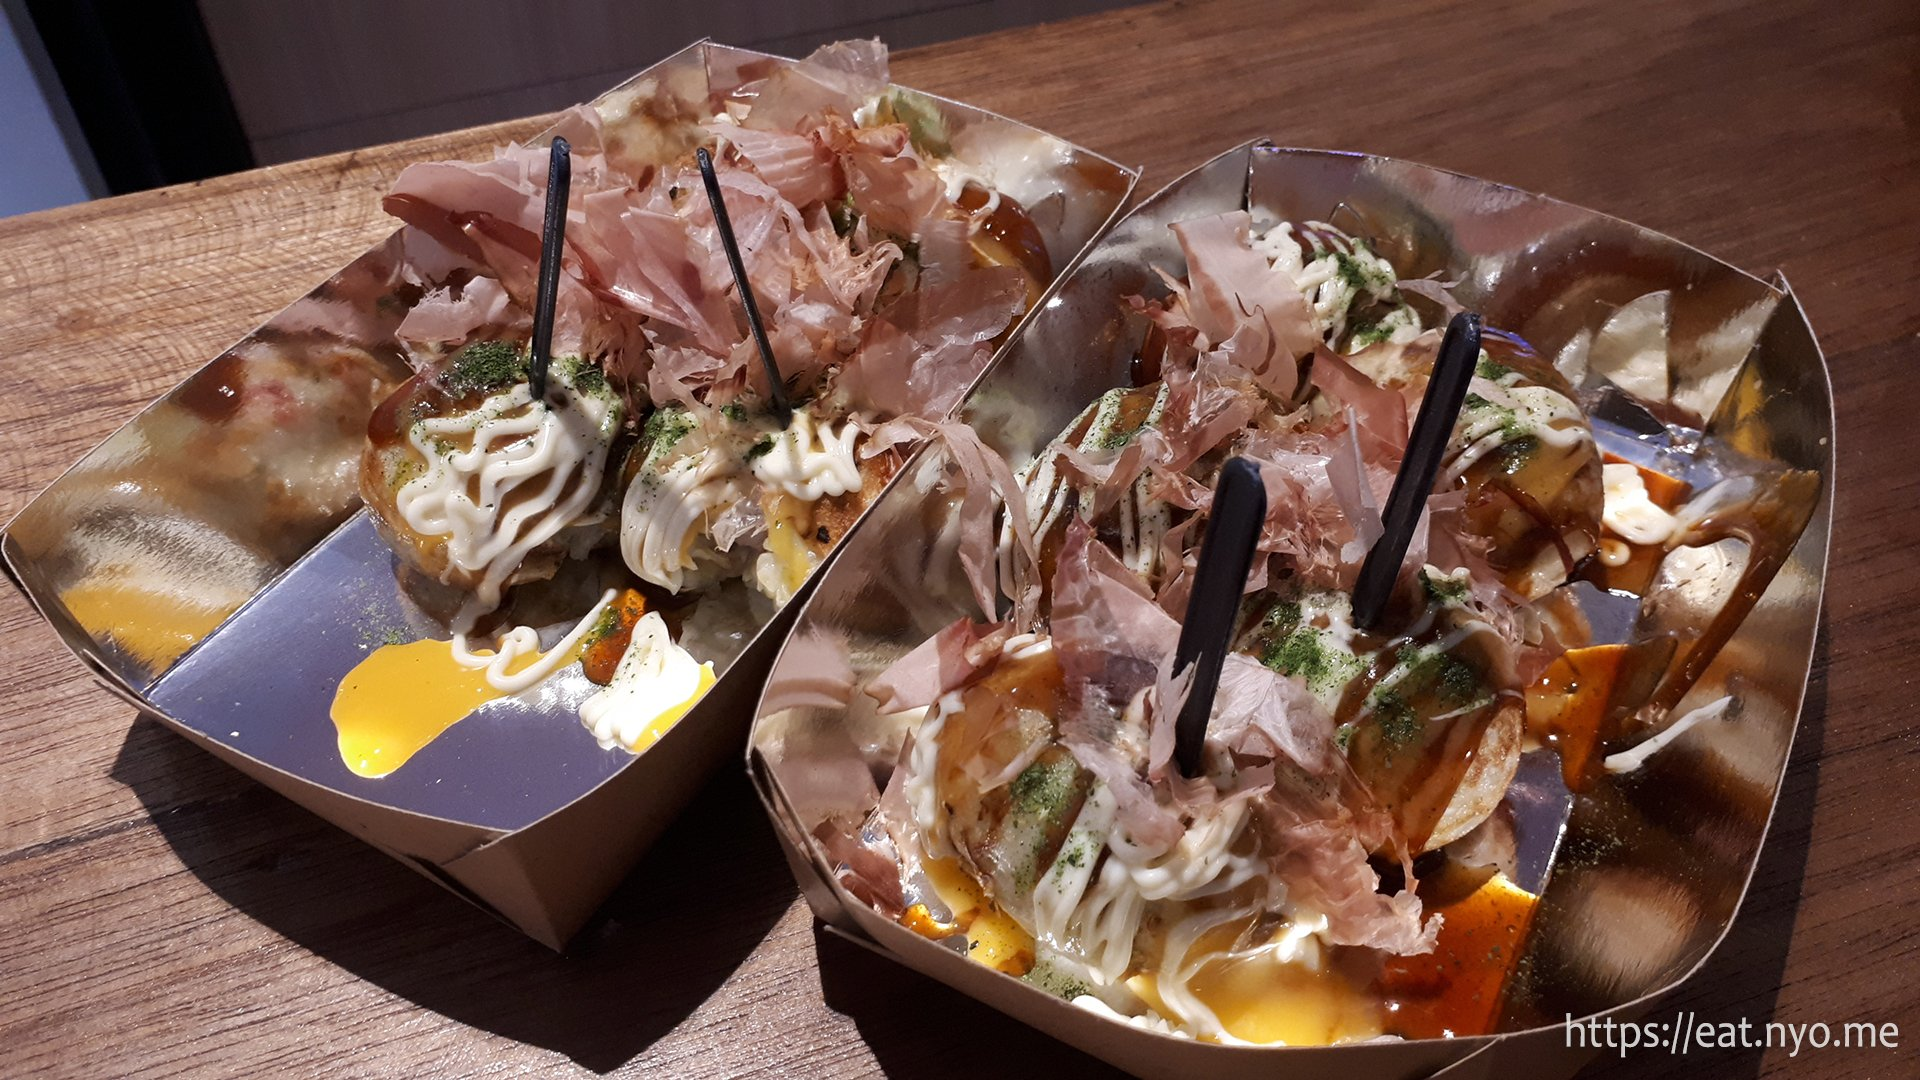 Hokkaido Takoyaki - Original Takoyaki